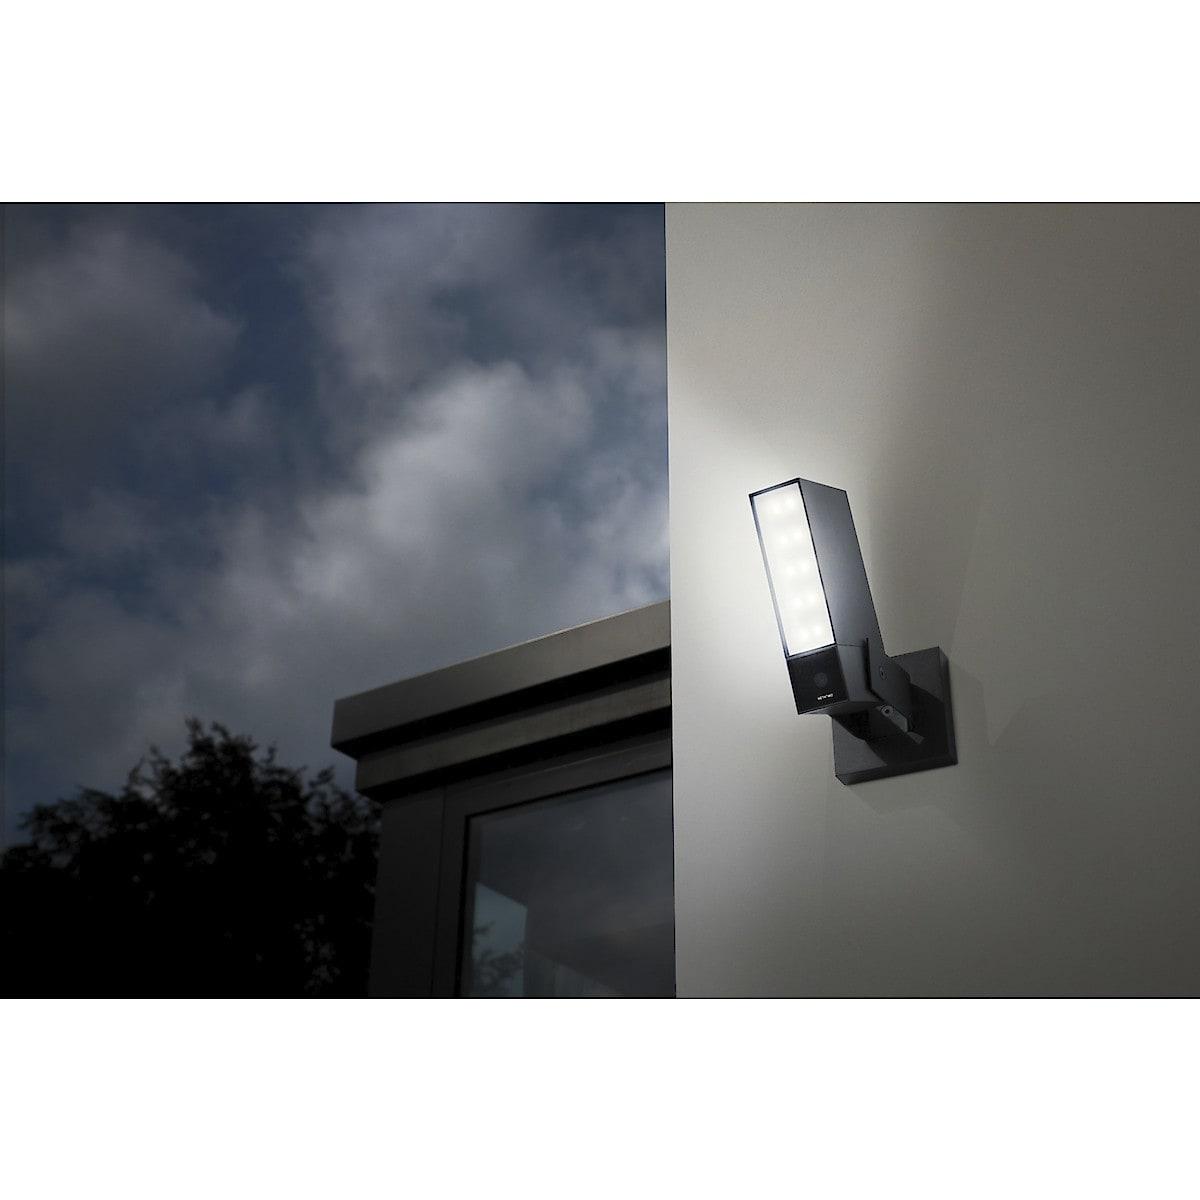 Smart utomhuskamera, Netatmo Presence